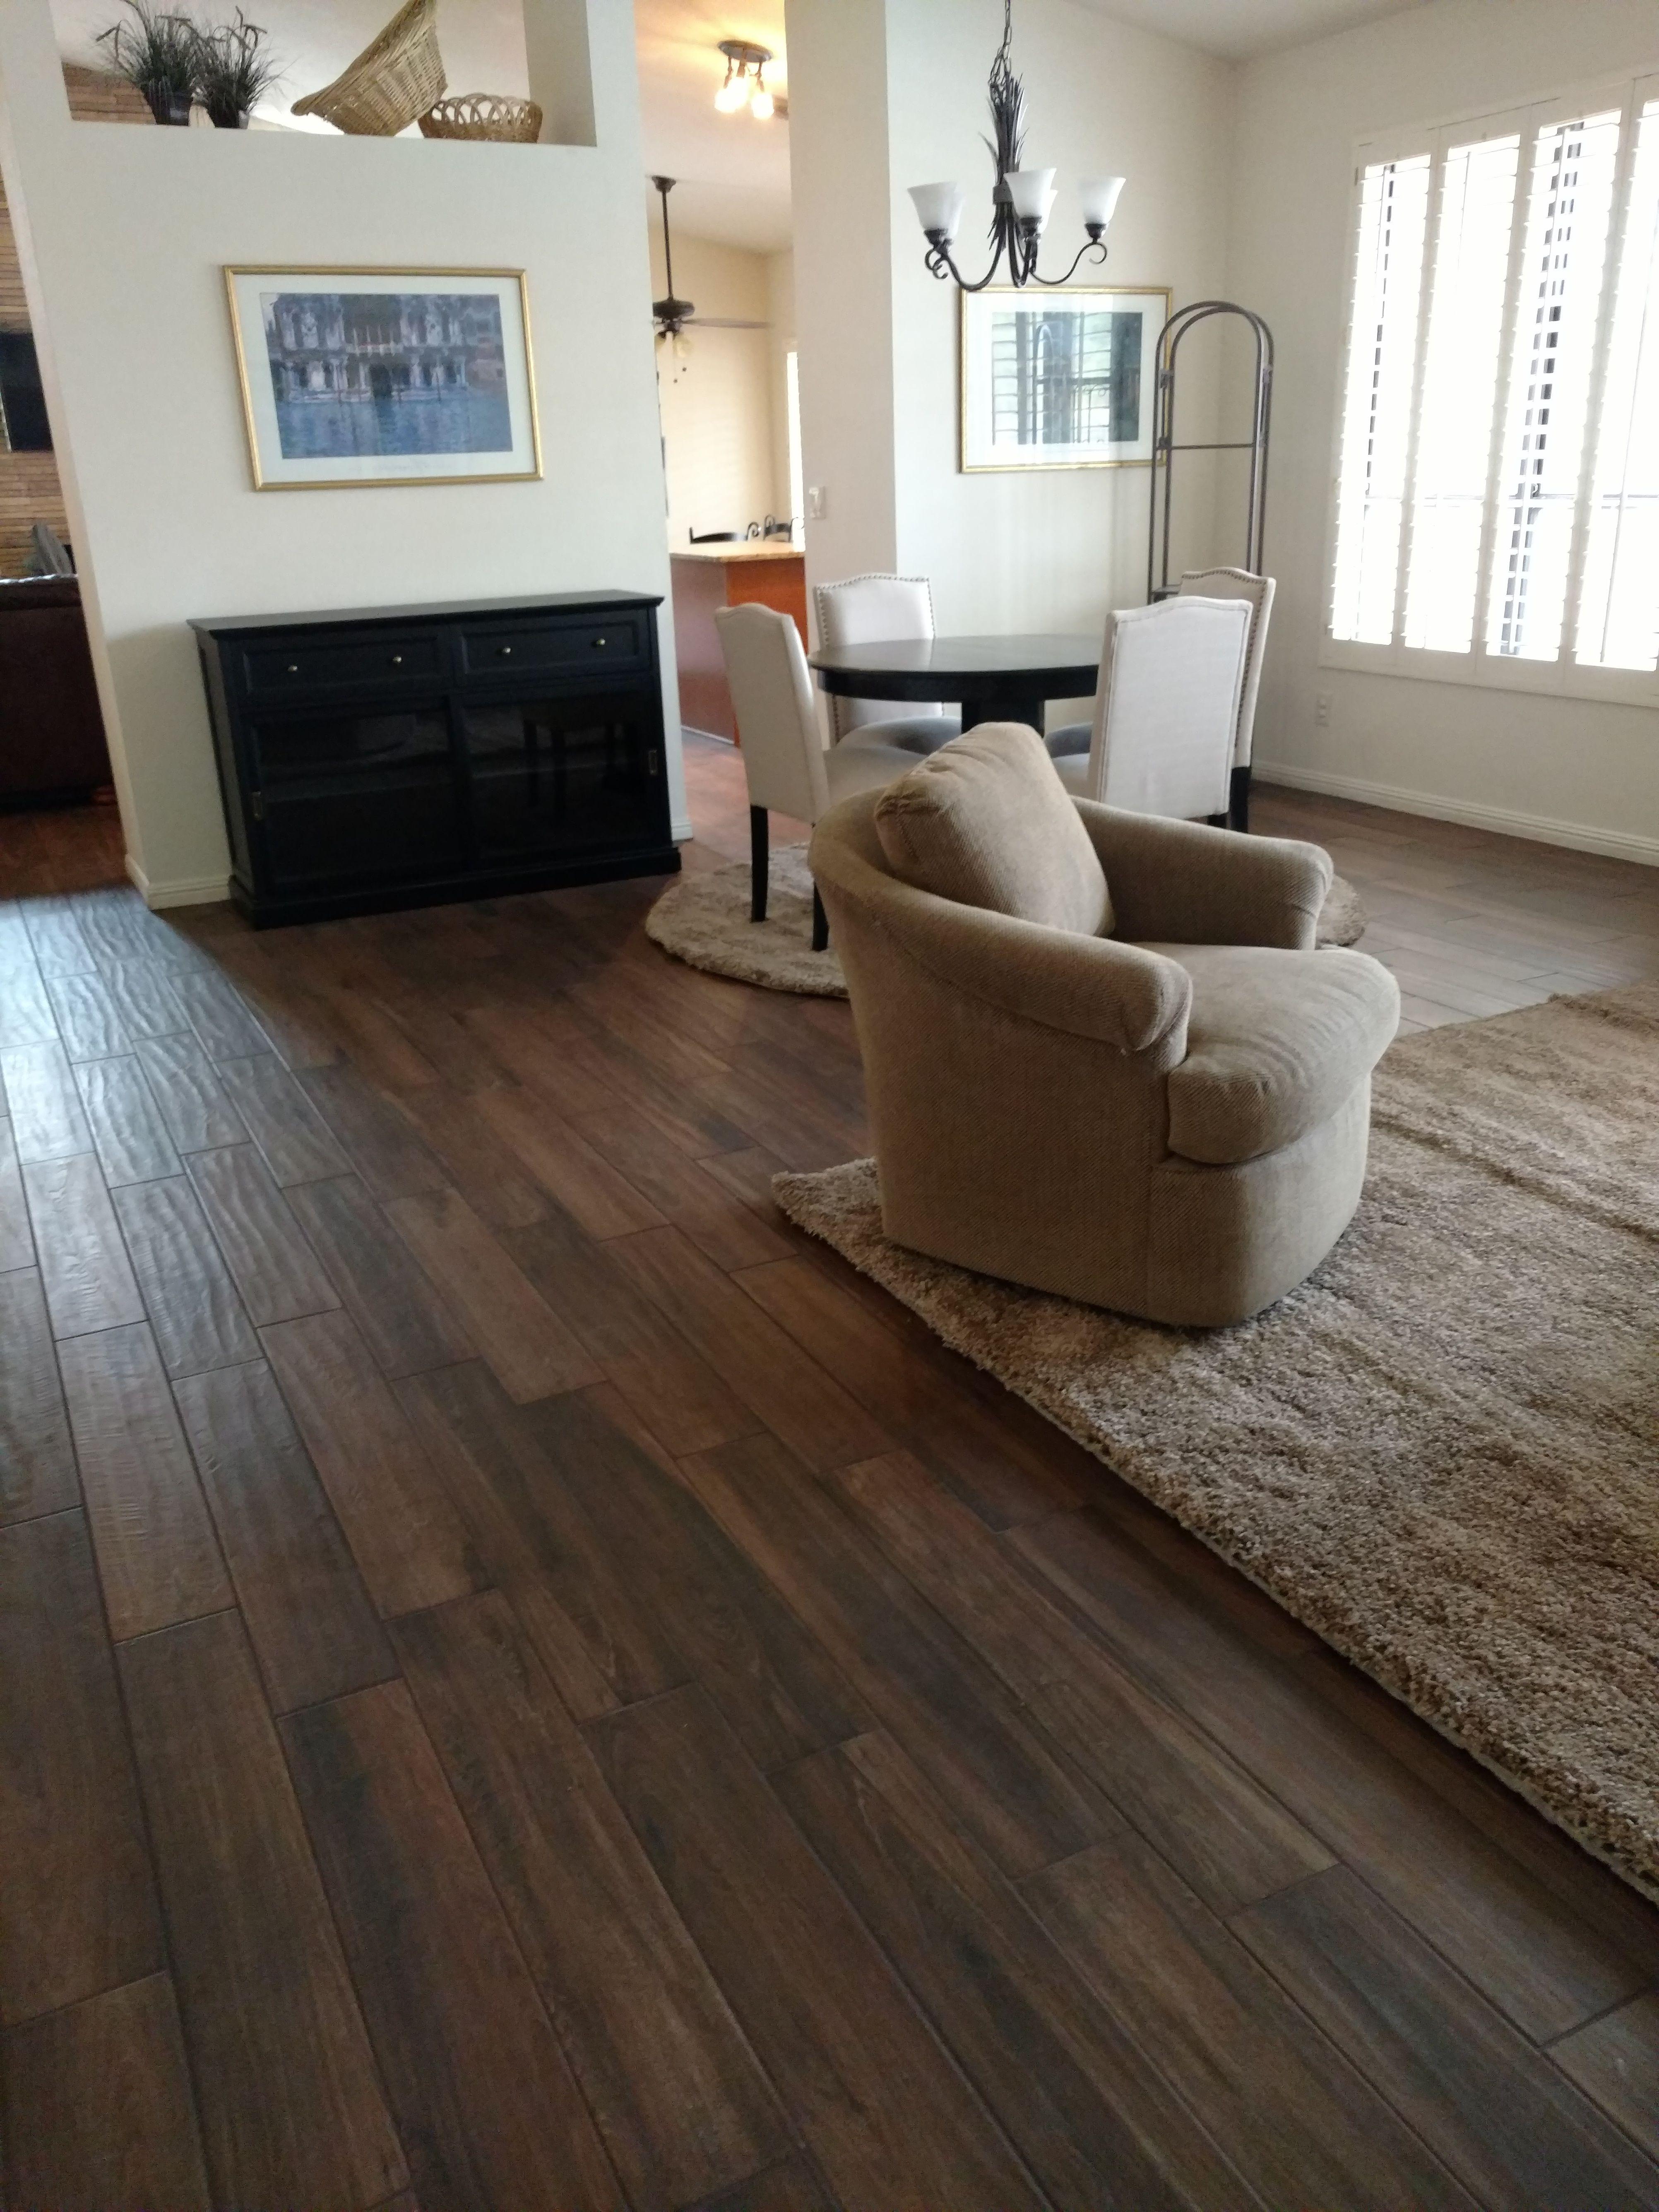 Daltile Saddlebrook Walnut Creek Tile Floor Floors Home Tiles Flats